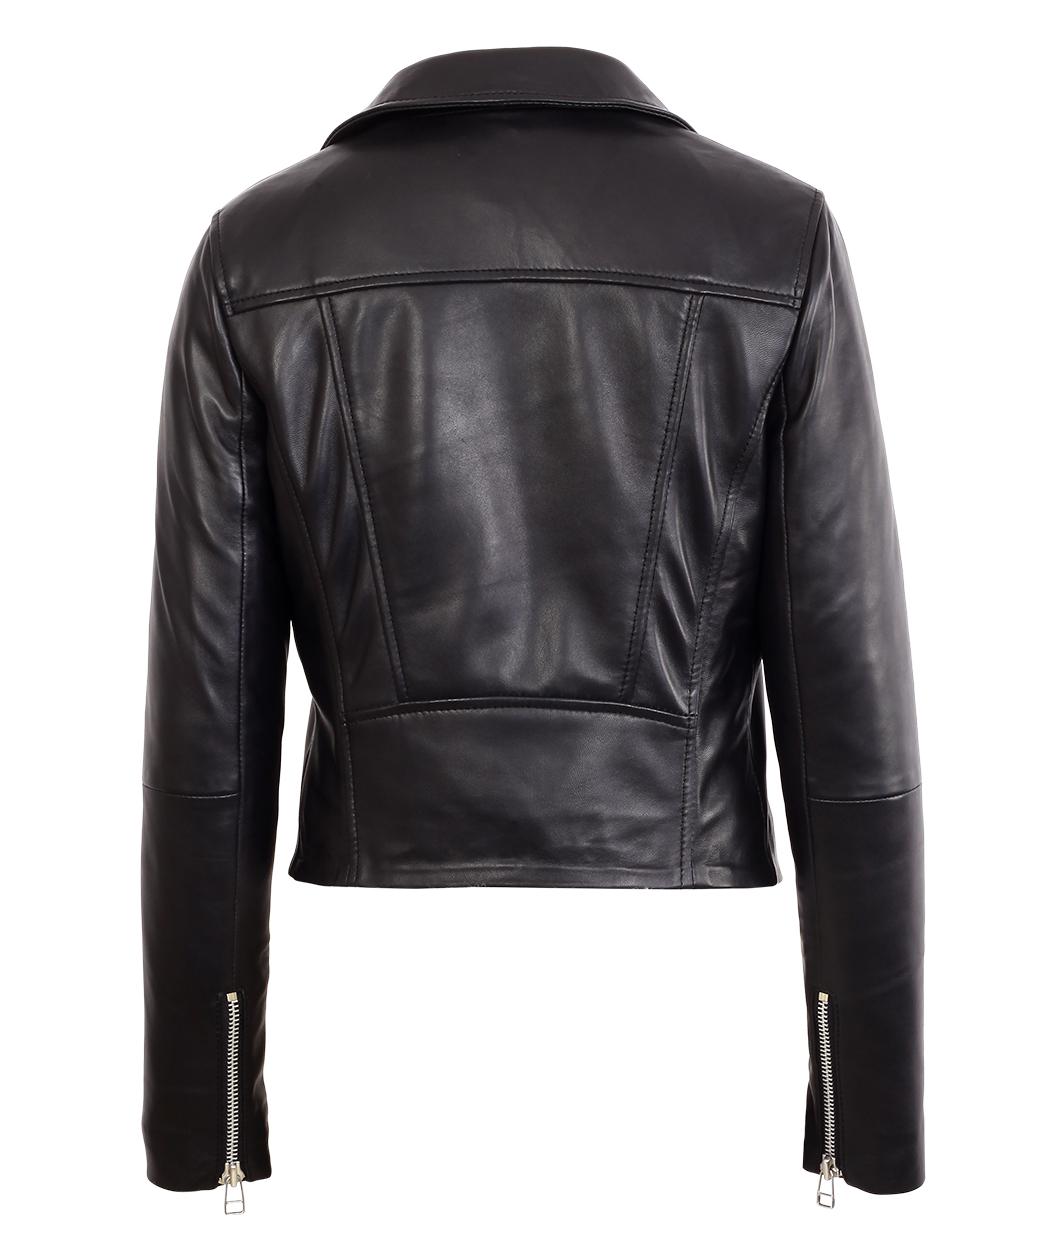 9de069492c5 ... Womens Black Asymmetrical Bomber Lambskin Real Leather Jacket. Sale!  IMG_7140 · IMG_7142 · IMG_7139